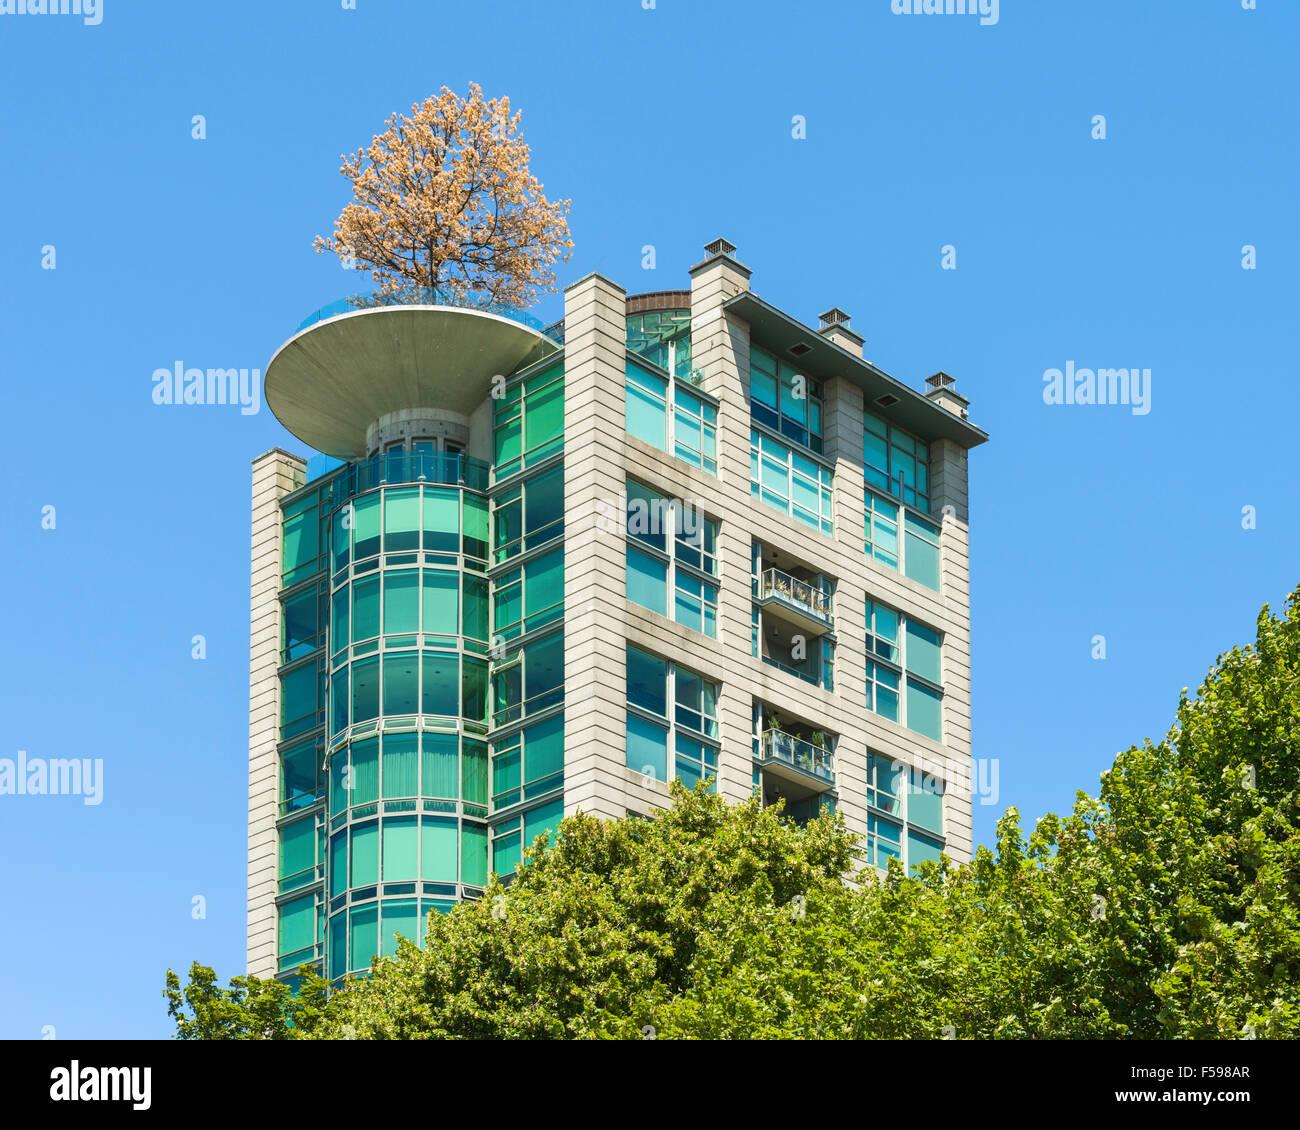 Pin Oak Apartments